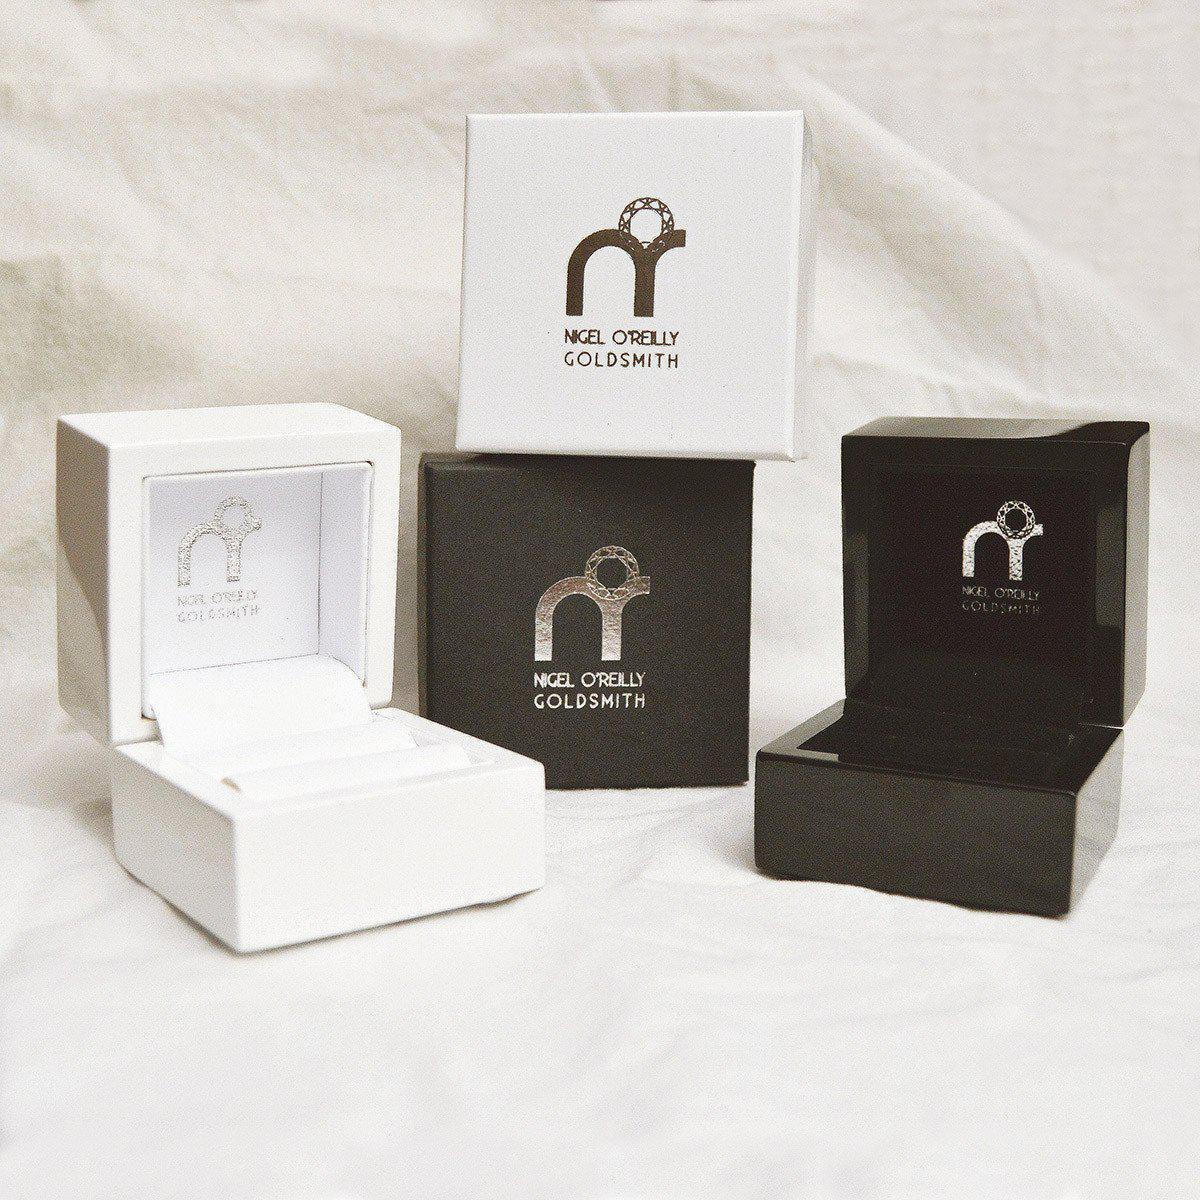 Nigel OReilly Goldsmith and Jewellery Design Sapphire Wedding Band/eternity Ring